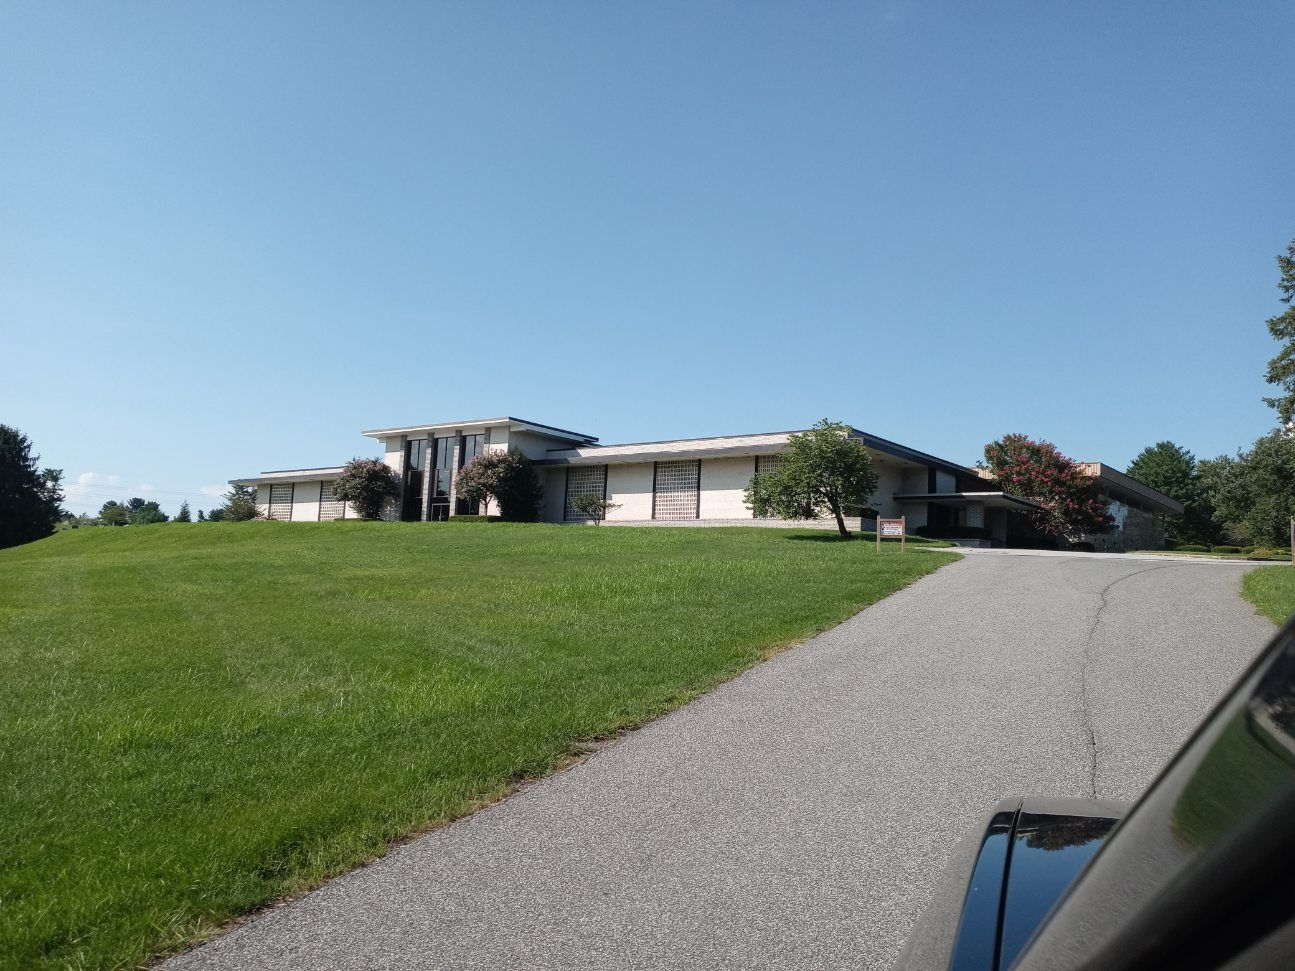 150162781ecd6871ec4ebf7a6feb7fa5 - Chapel Lawn Funeral Home And Memorial Gardens